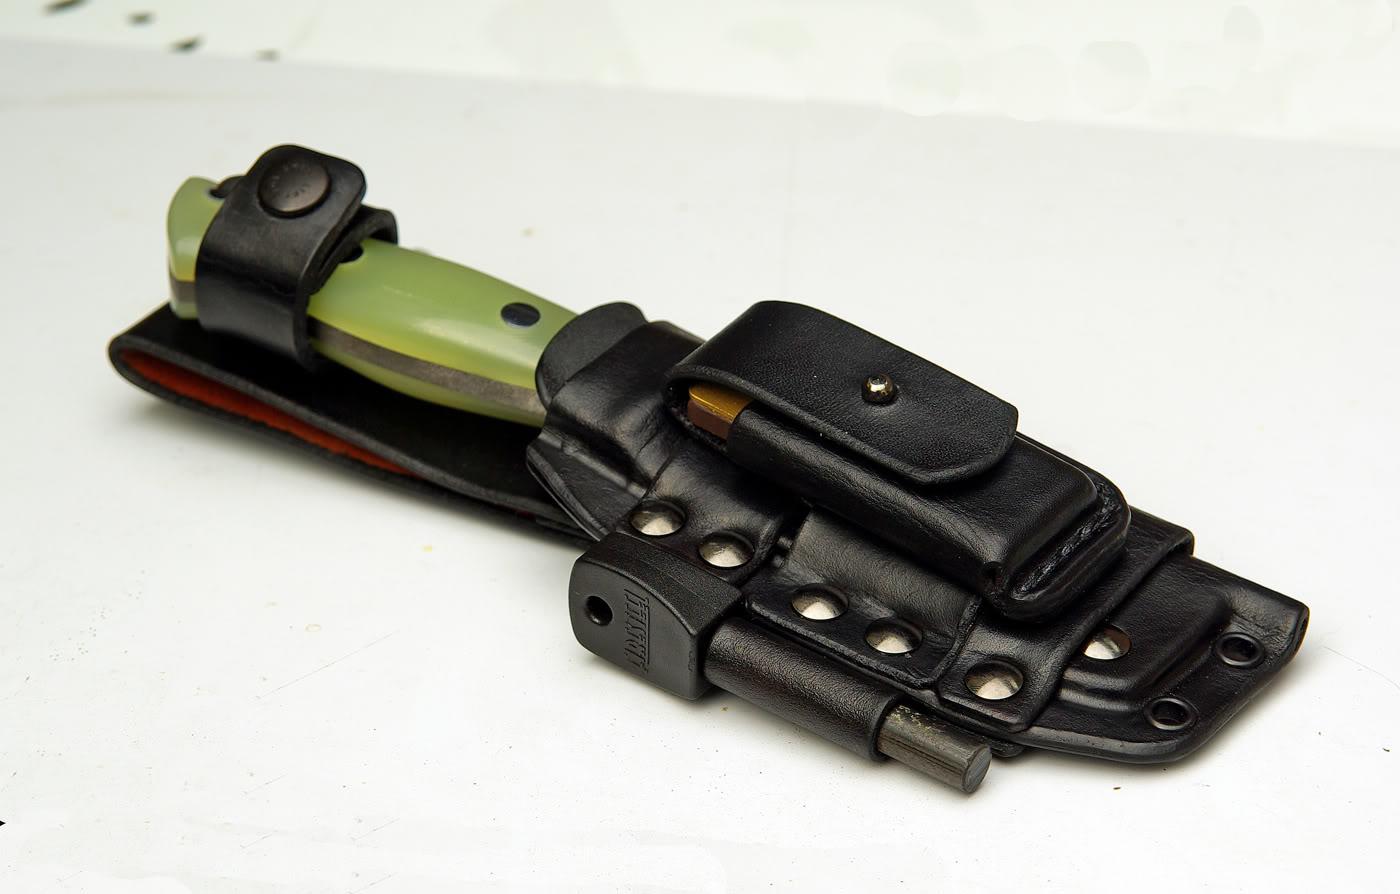 Sierra, hacha y cuchillo, la alternativa lógica a un único cuchillo grande BRKTBravo-1technicalsheath01